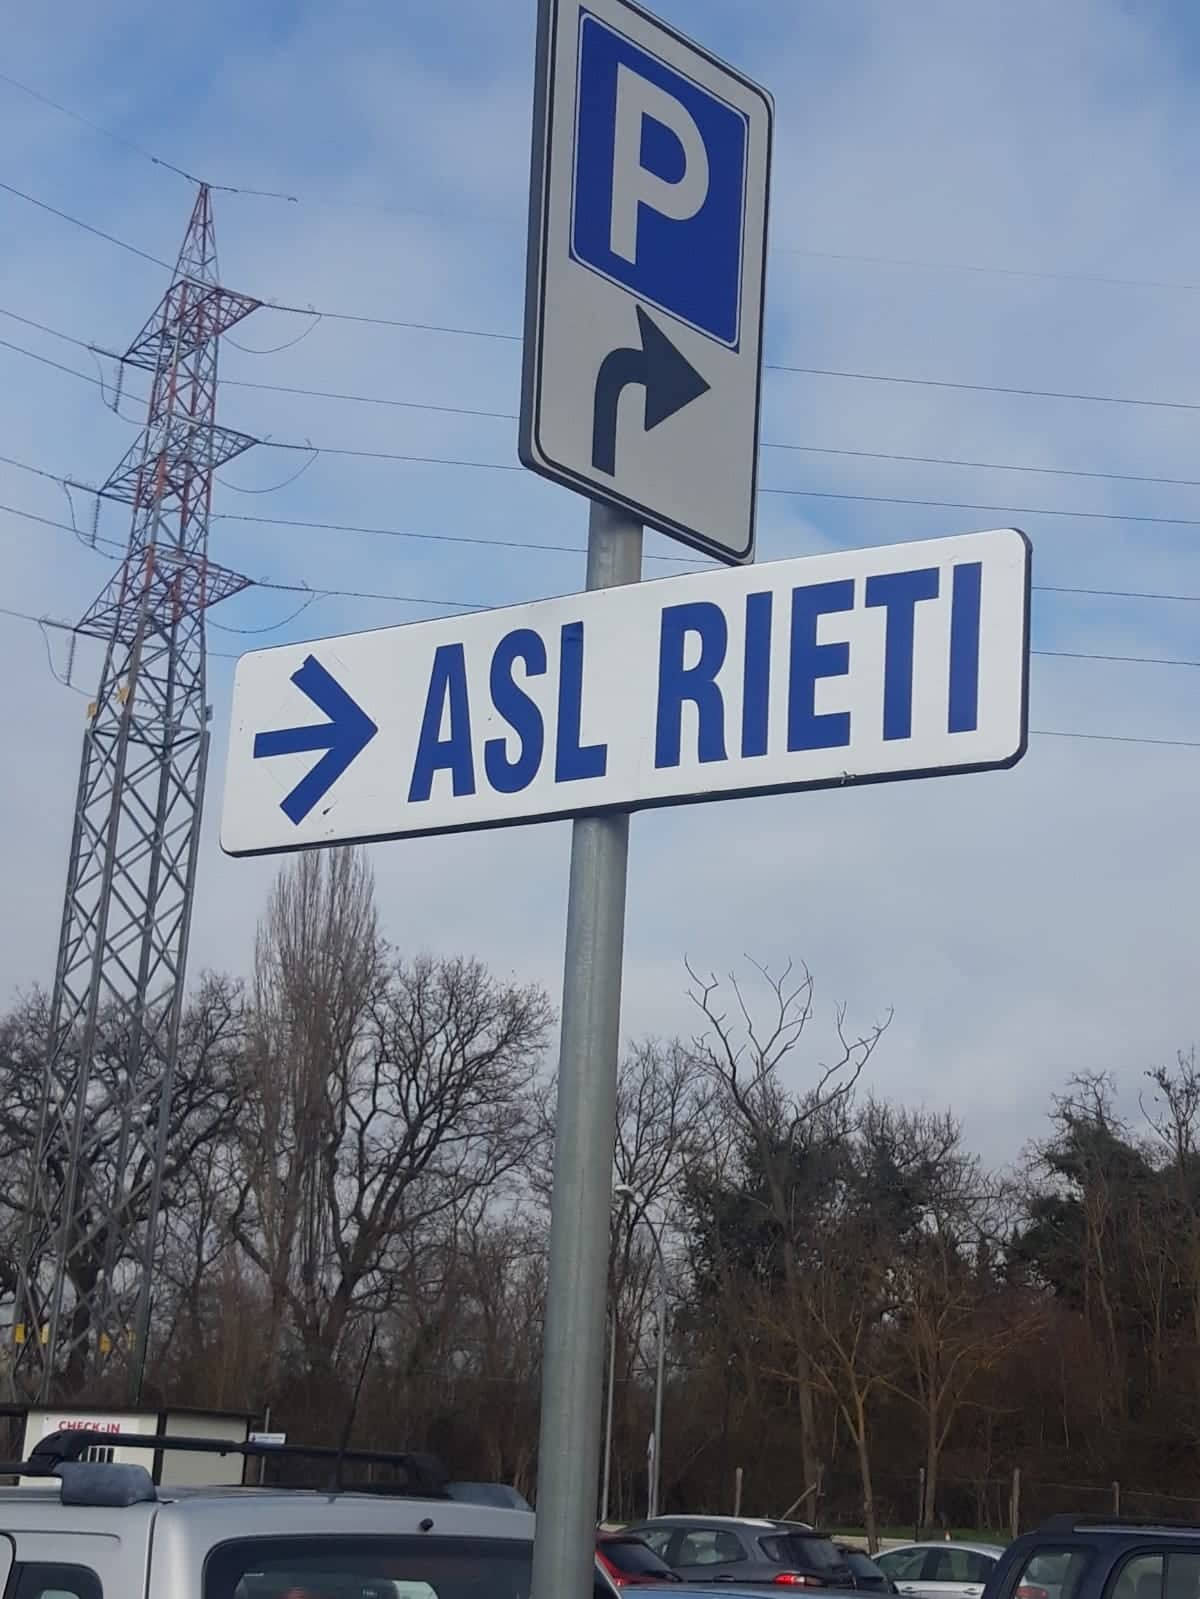 19 nuovi postivi in provincia di Rieti, 8 i guariti